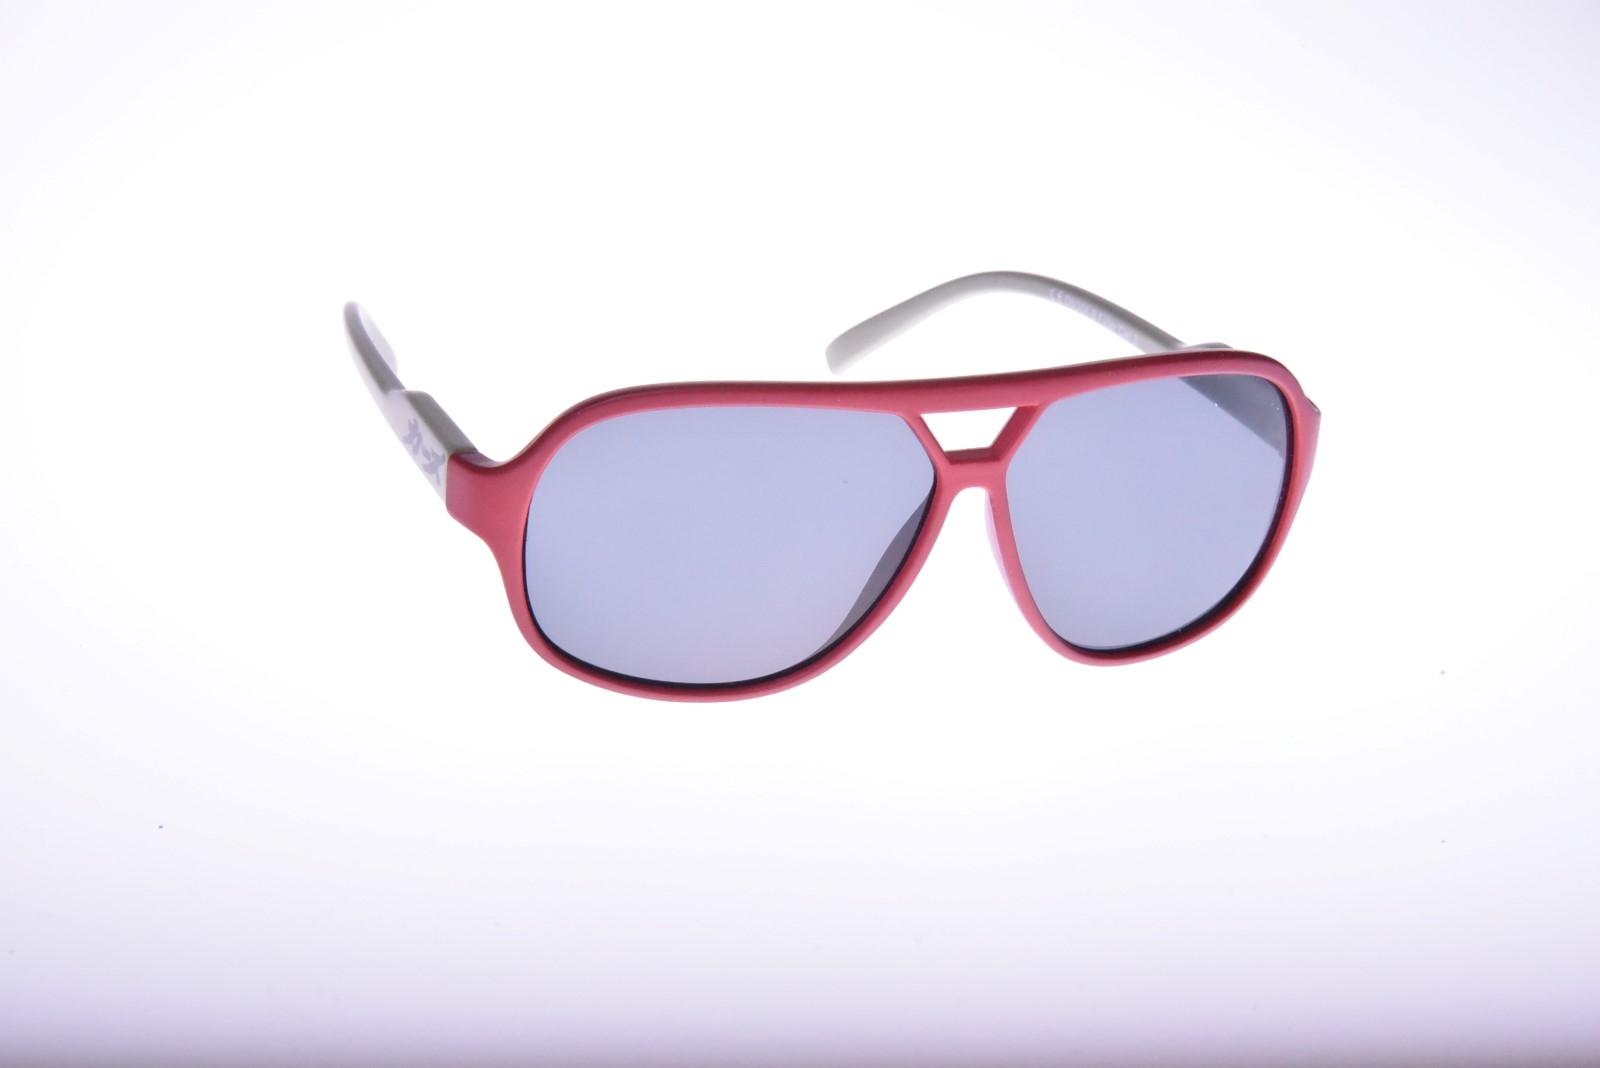 Polaroid Disney D6306B - Slnečné okuliare pre deti 4-7 r.